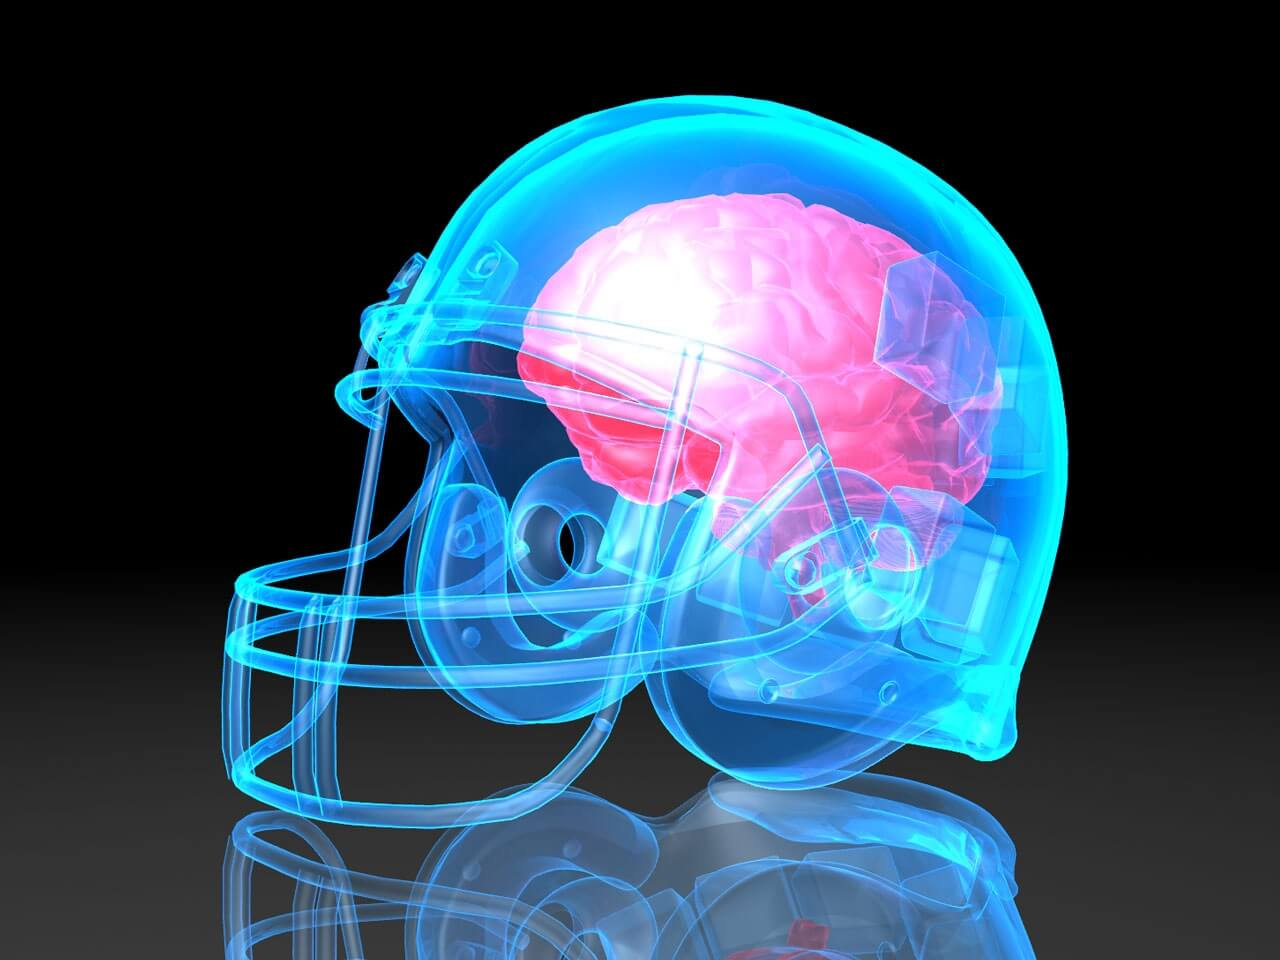 Raizner Slania Files Concussion Lawsuit On Behalf Of Mississippi State Athlete